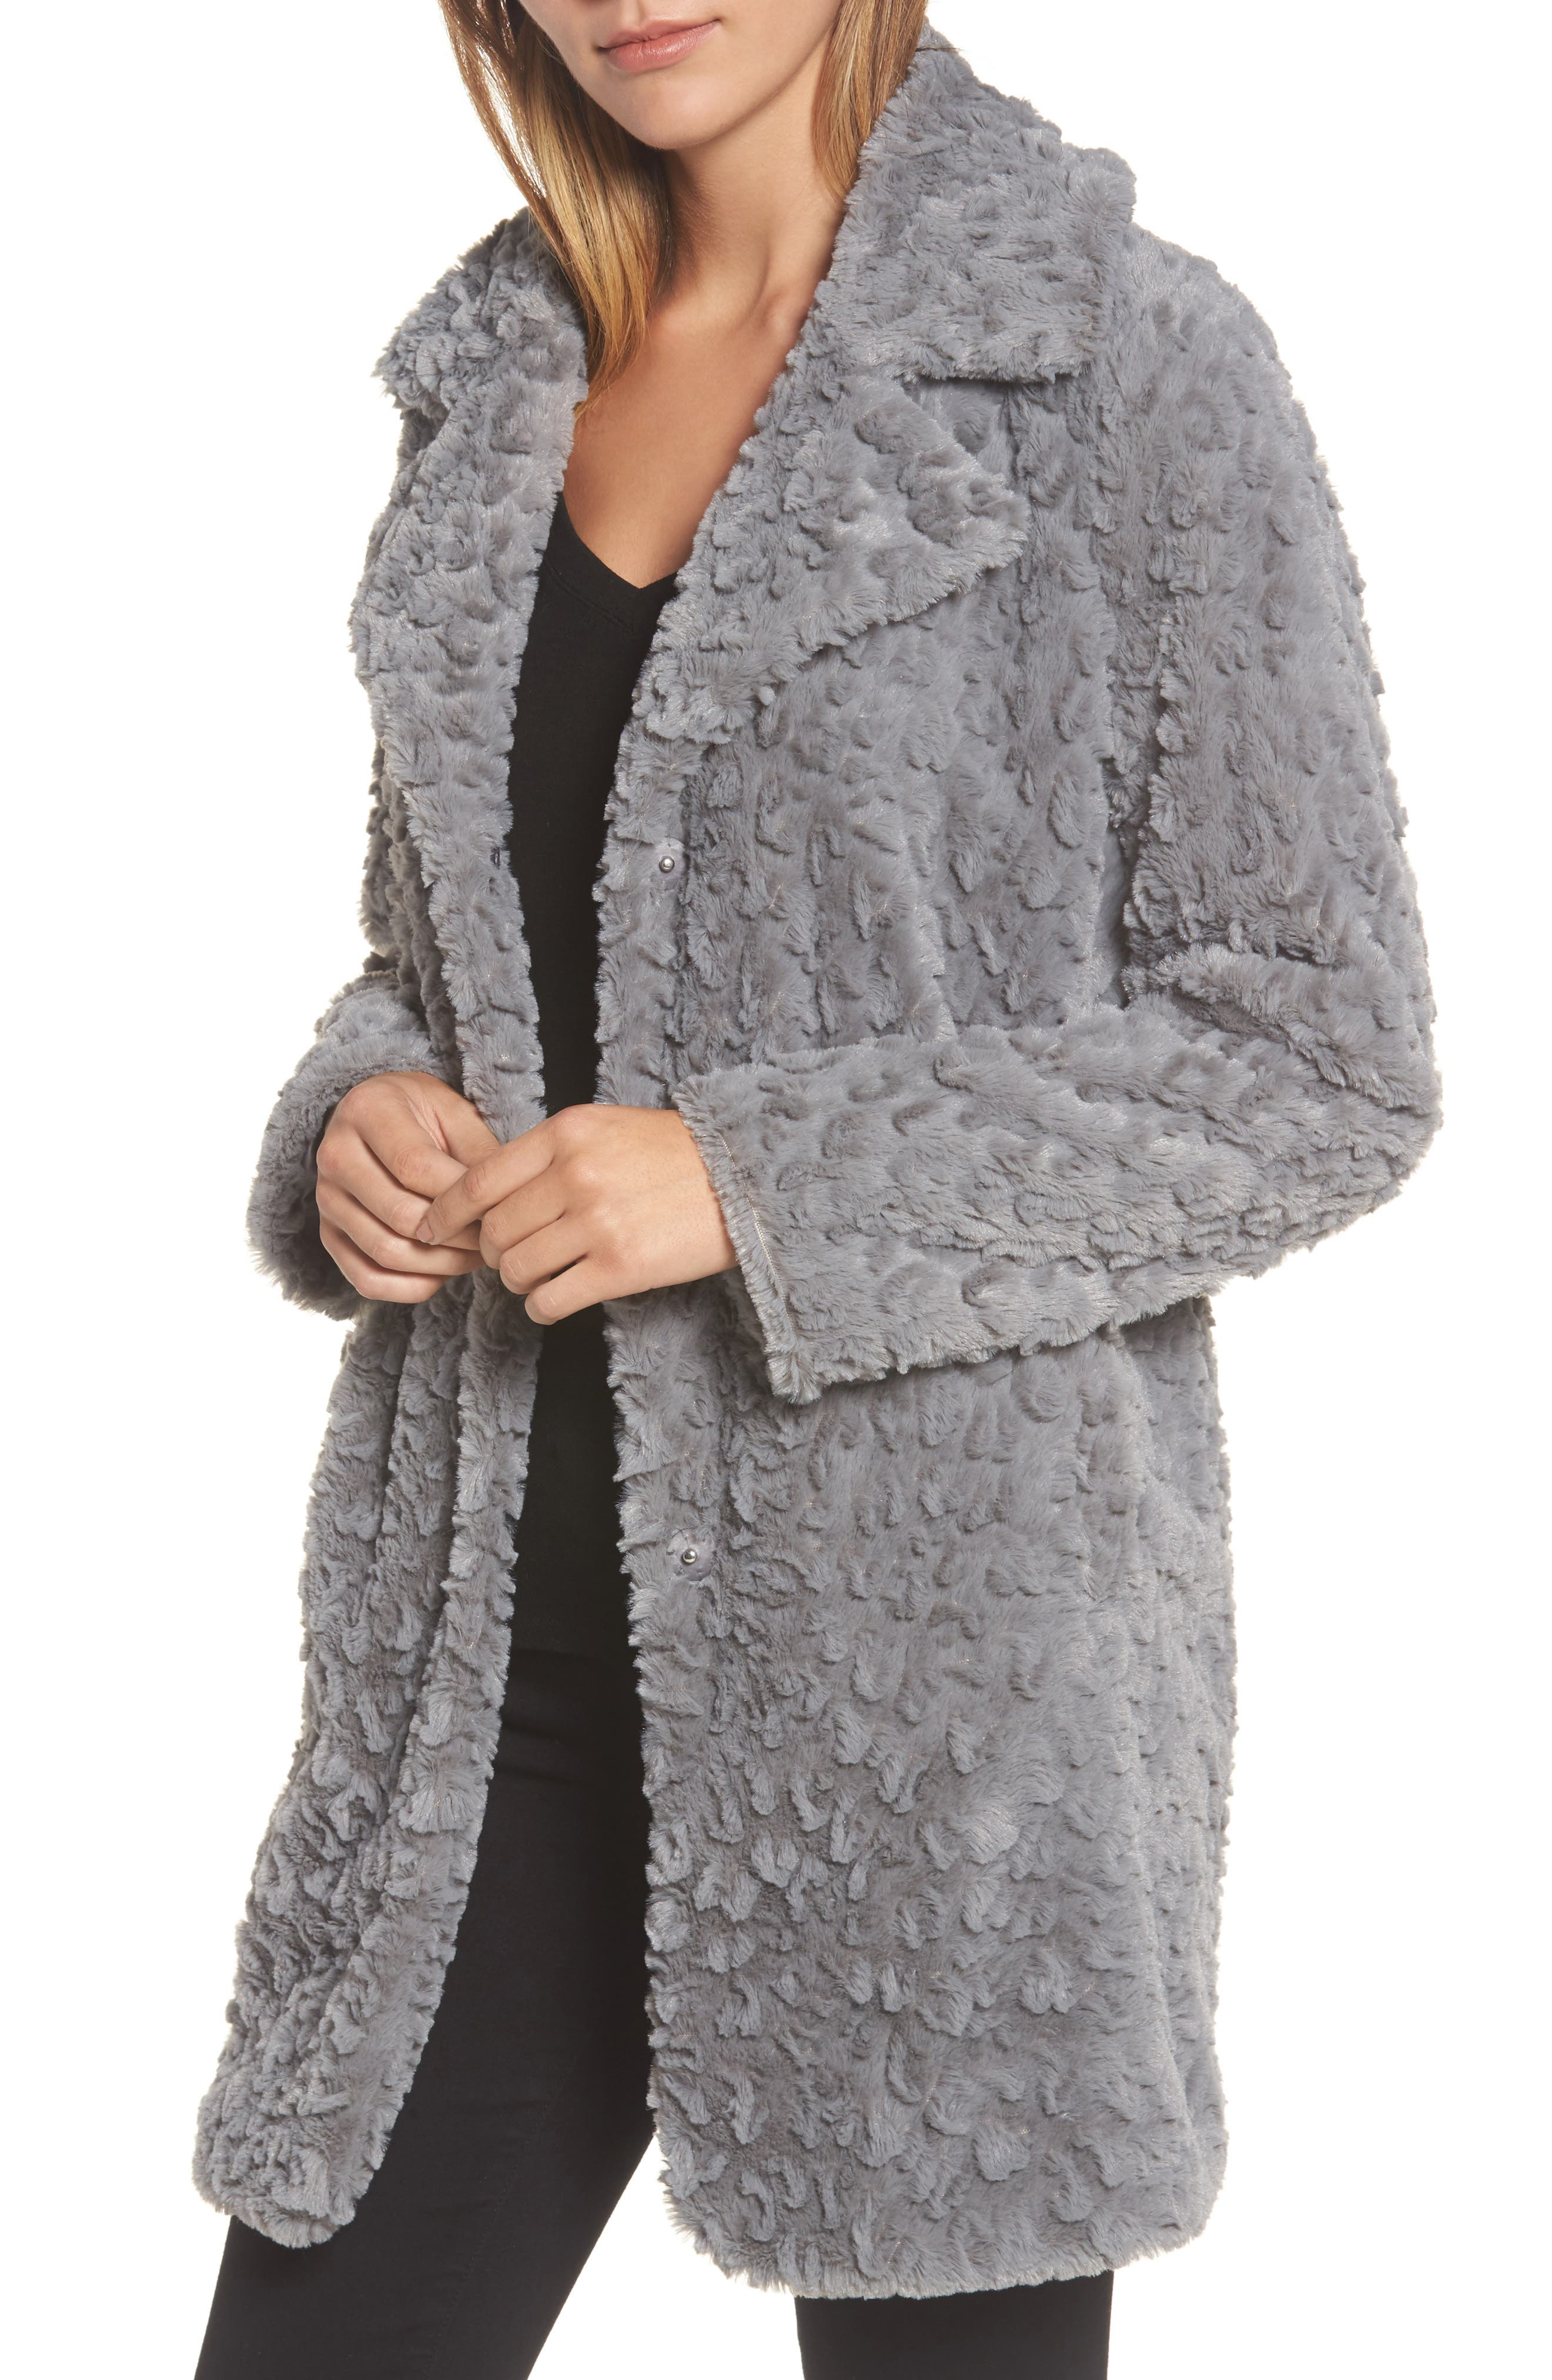 Alternate Image 1 Selected - Kenneth Cole New York Faux Fur Coat (Regular & Petite)